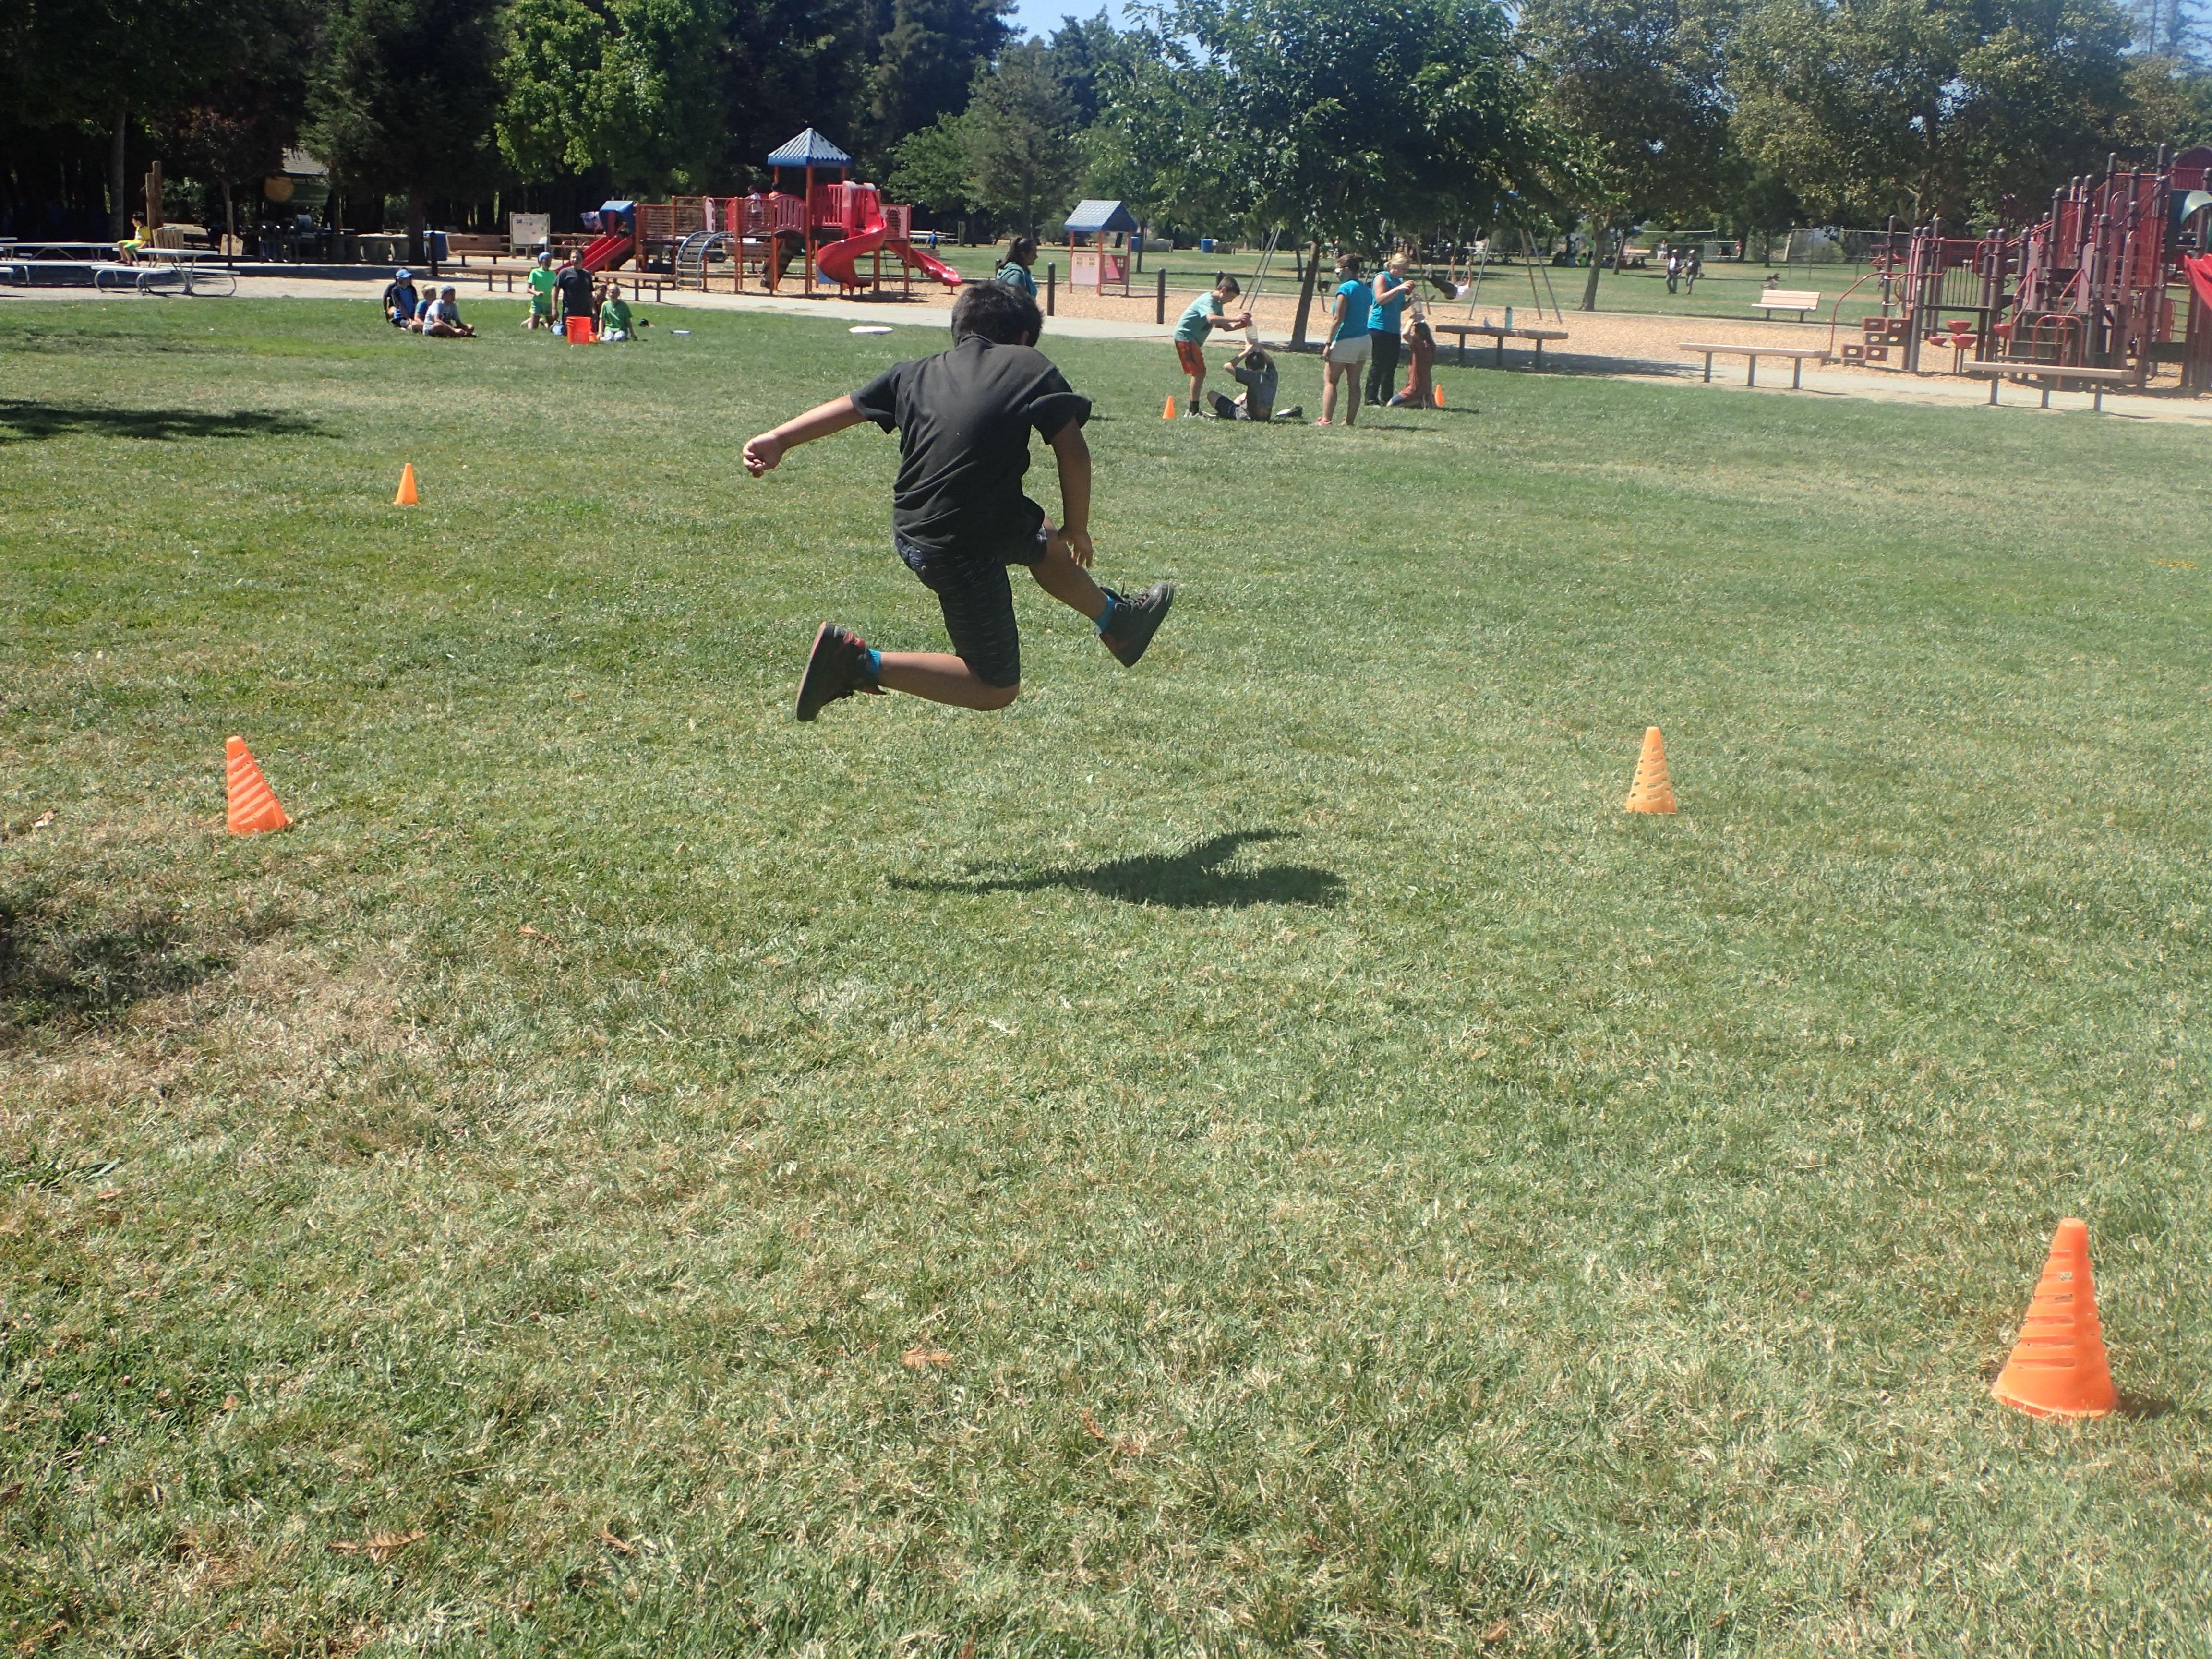 Olympic Long Jump